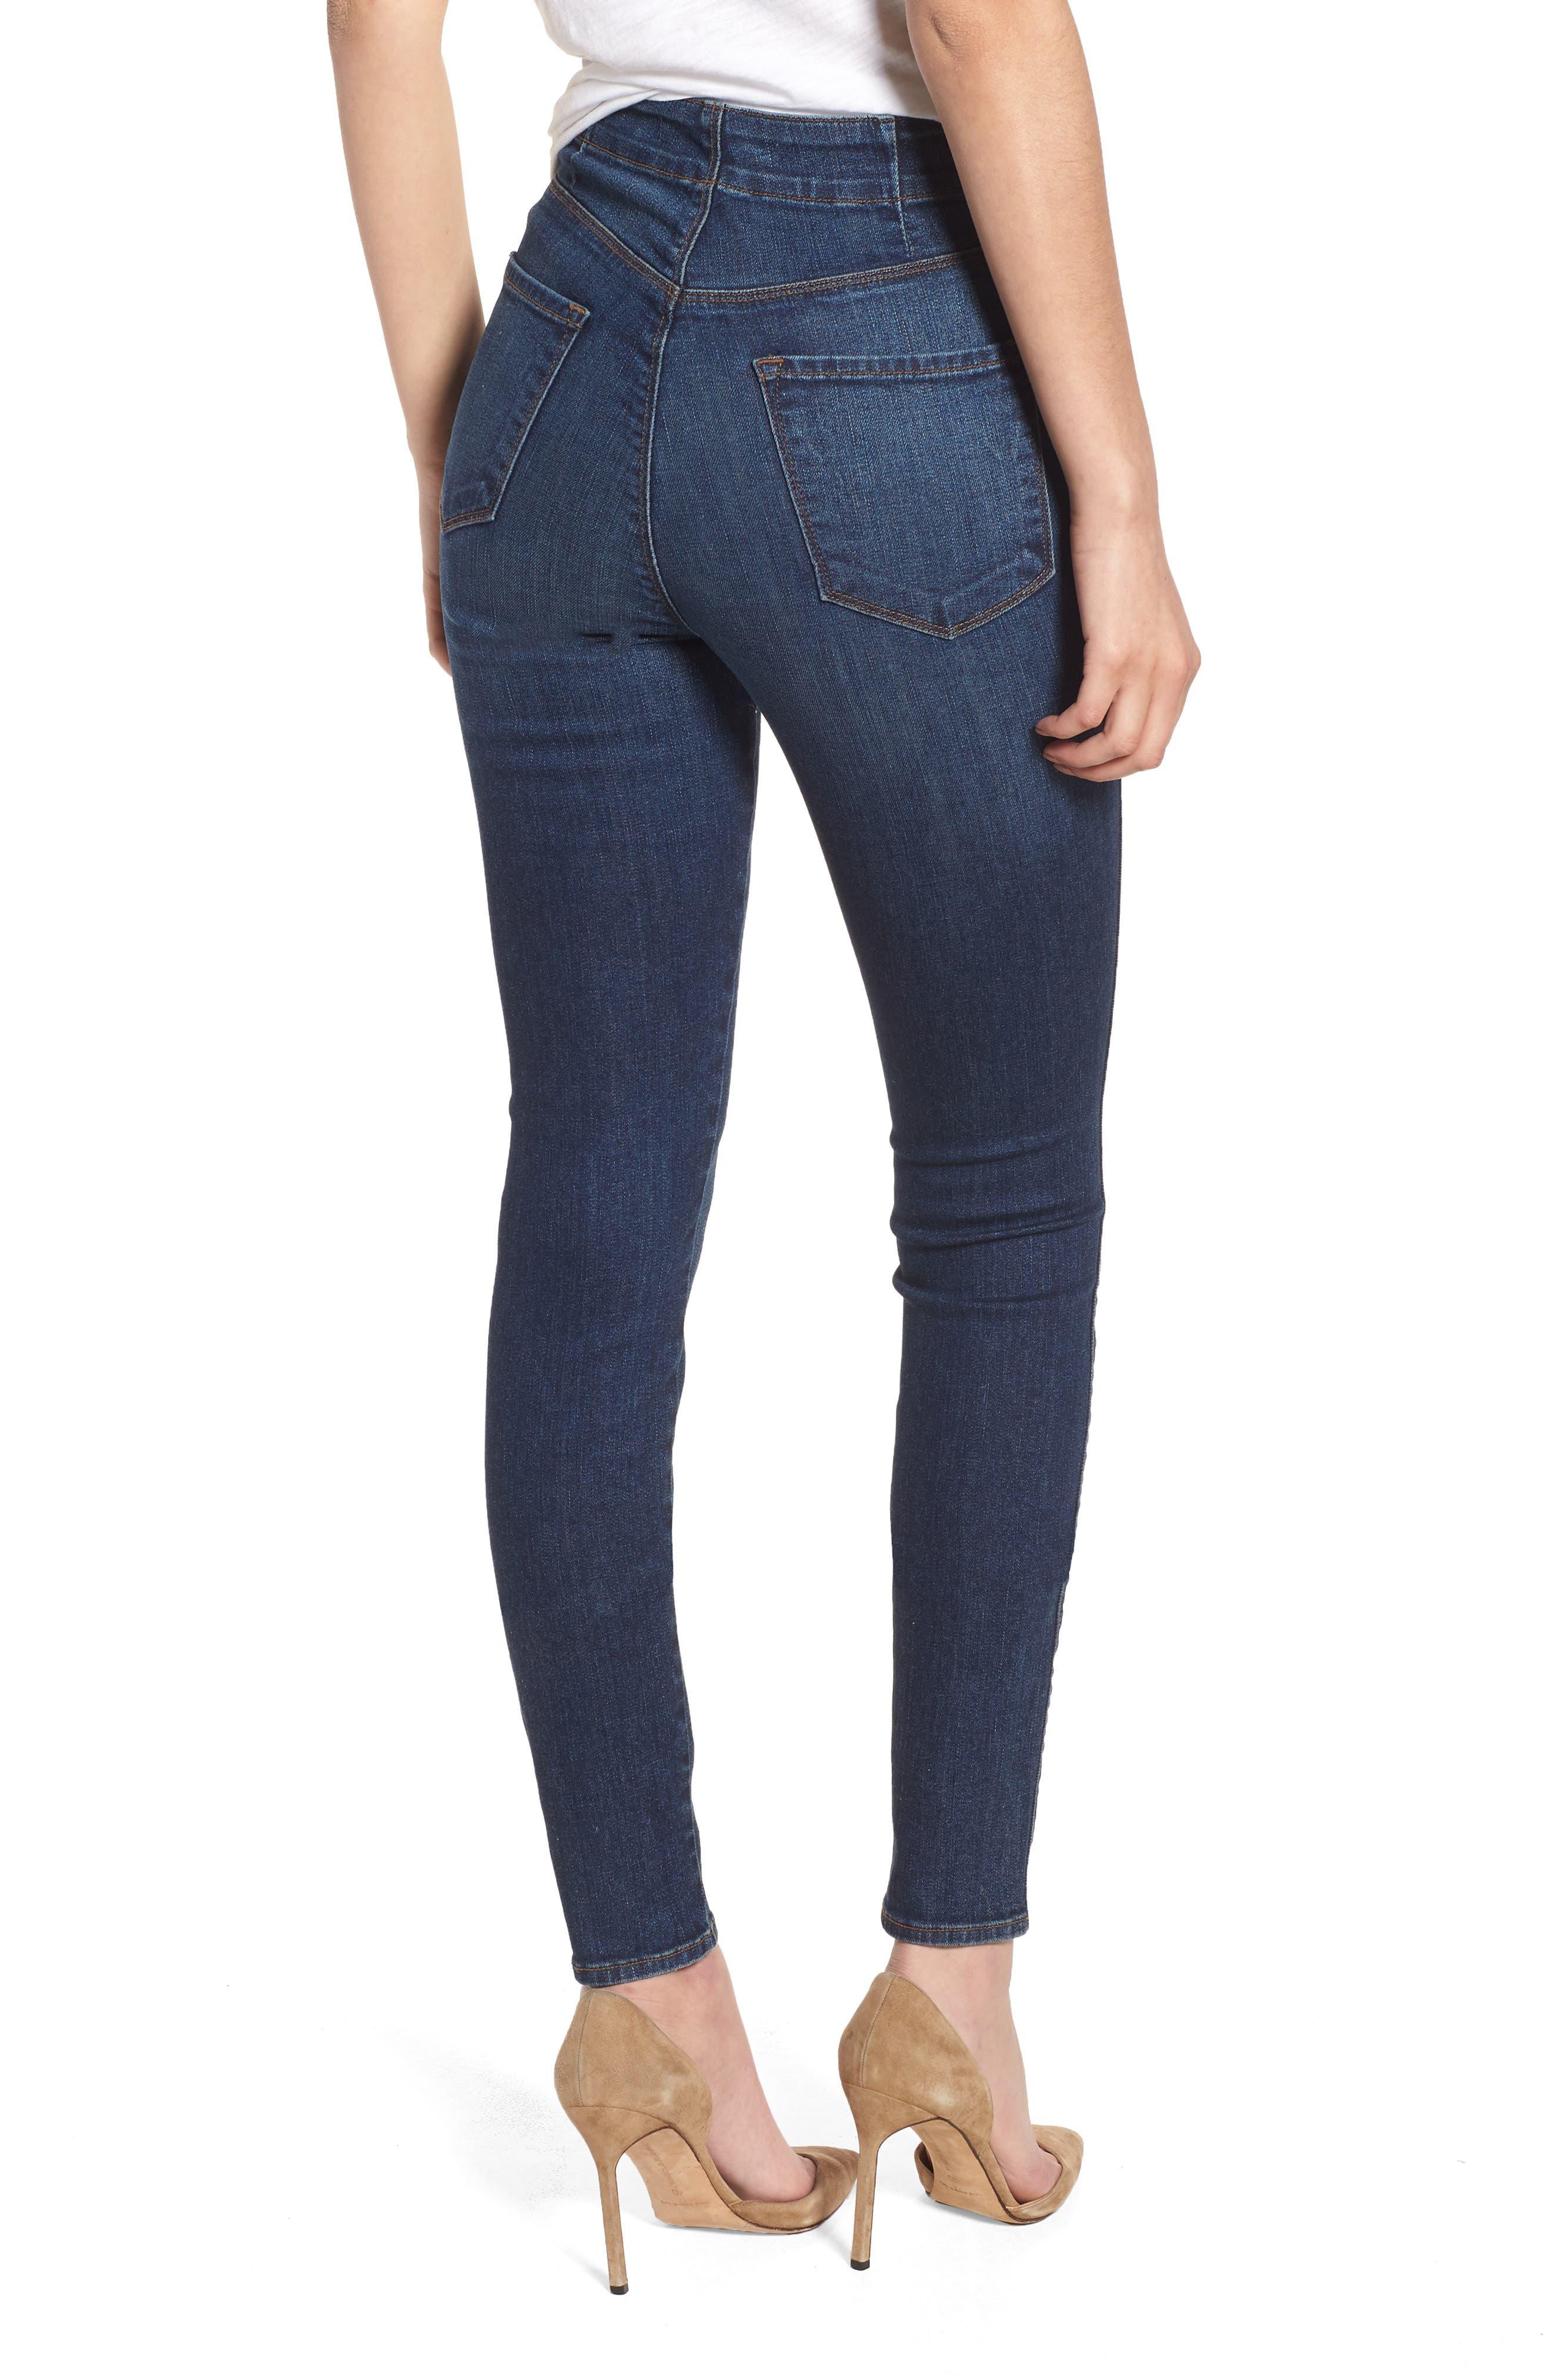 Natasha Sky High High Waist Skinny Jeans,                             Alternate thumbnail 2, color,                             Revival